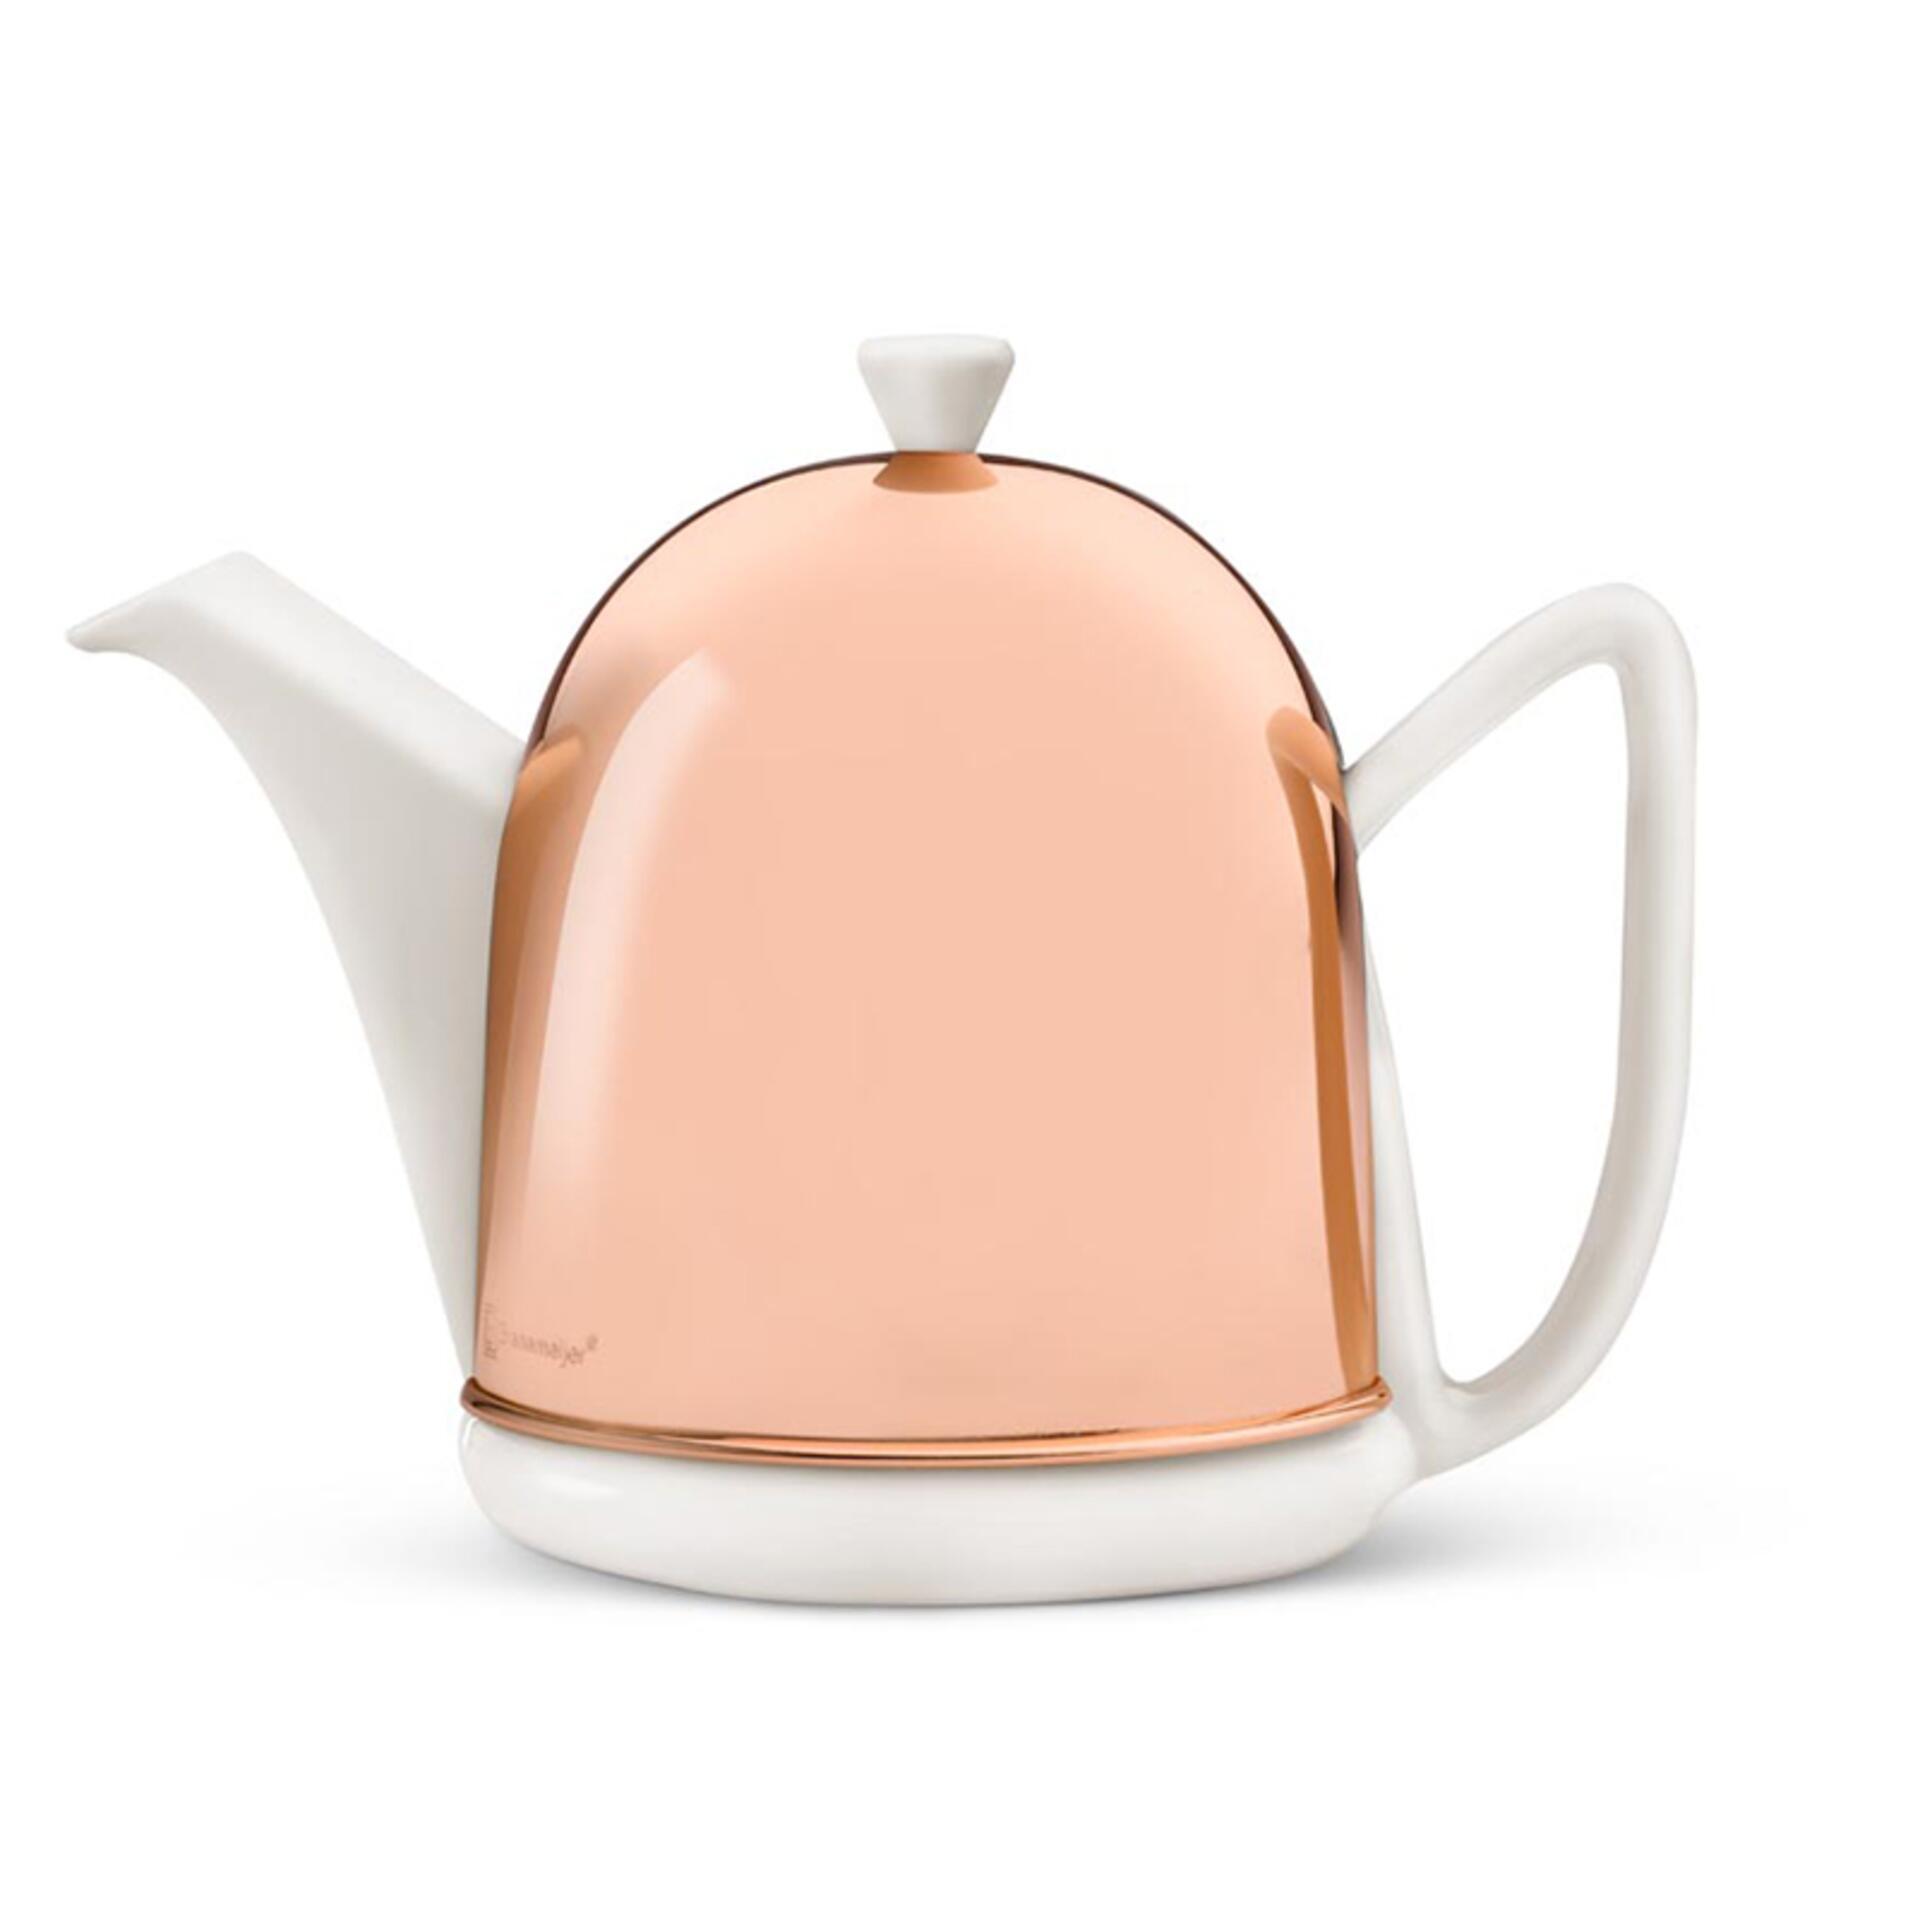 Bredemeijer Teekanne Cosy Manto 1,0 l Kupfer Weiß